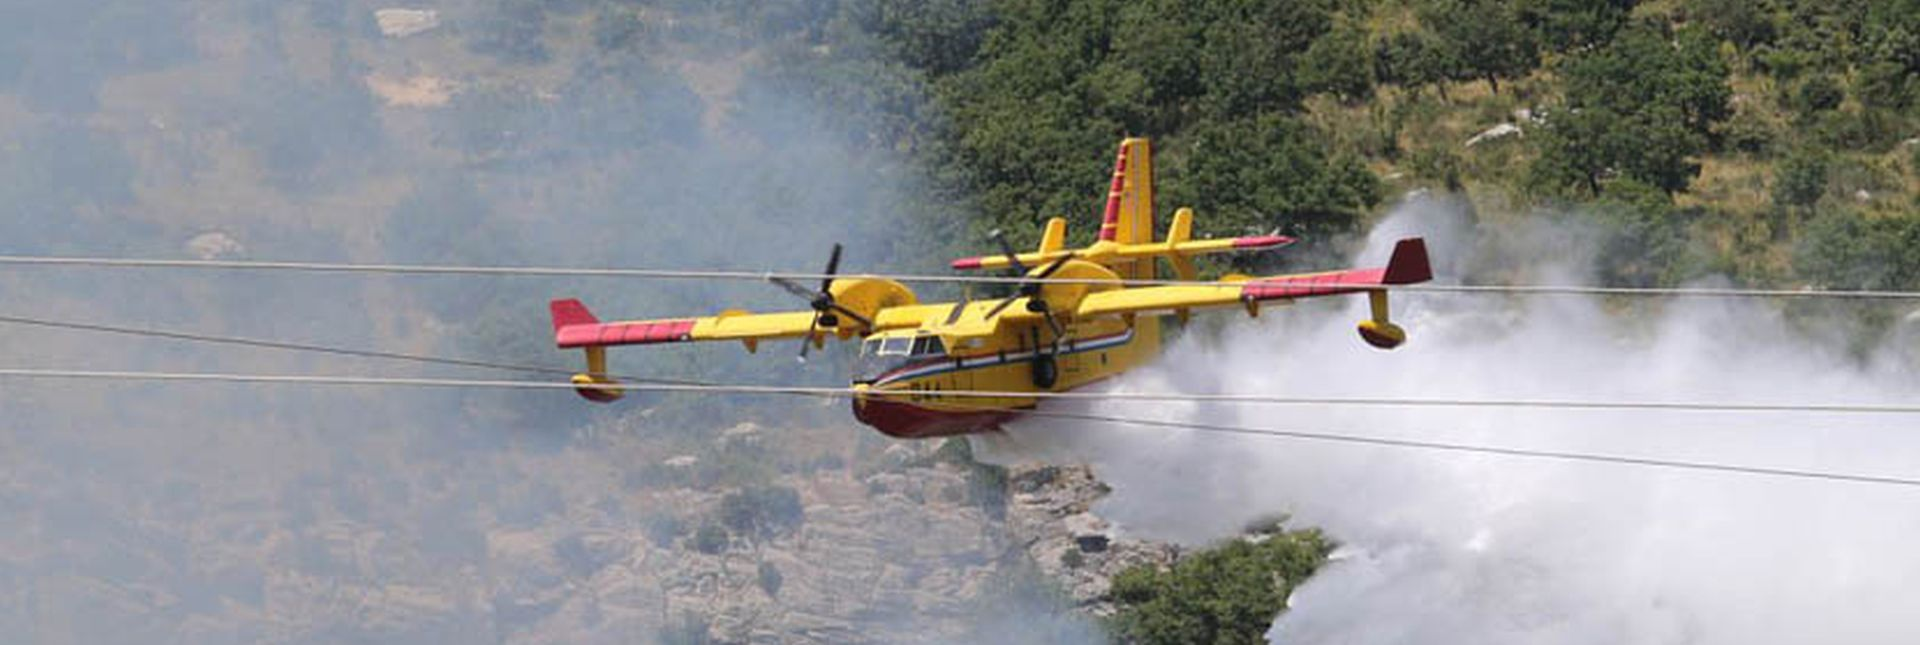 Dva Aitractora gase požar kod Nina